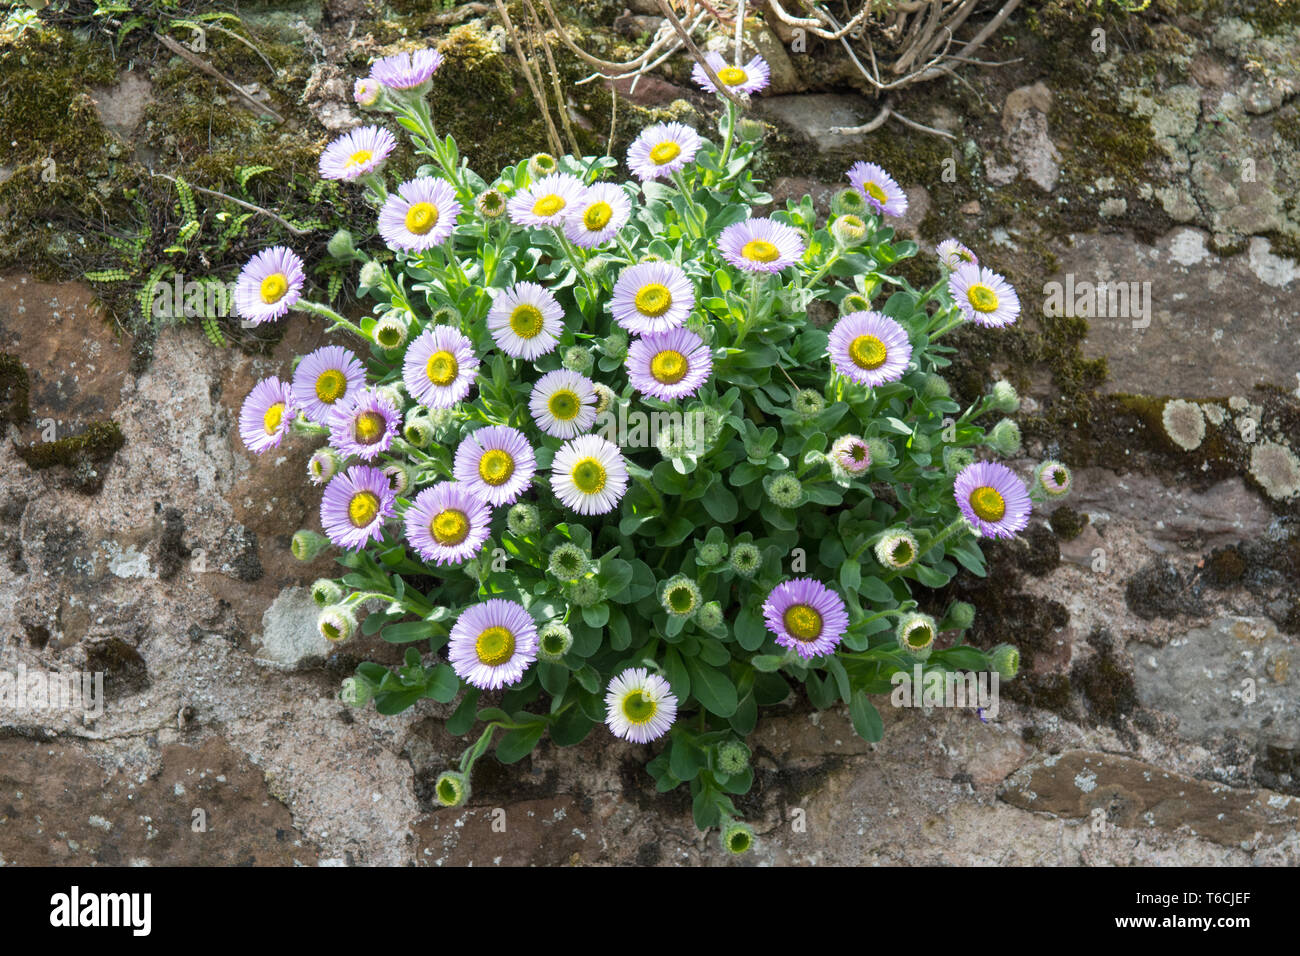 Erigeron Glaucus or seaside daisy or fleabane plant growing on a wall - UK Stock Photo